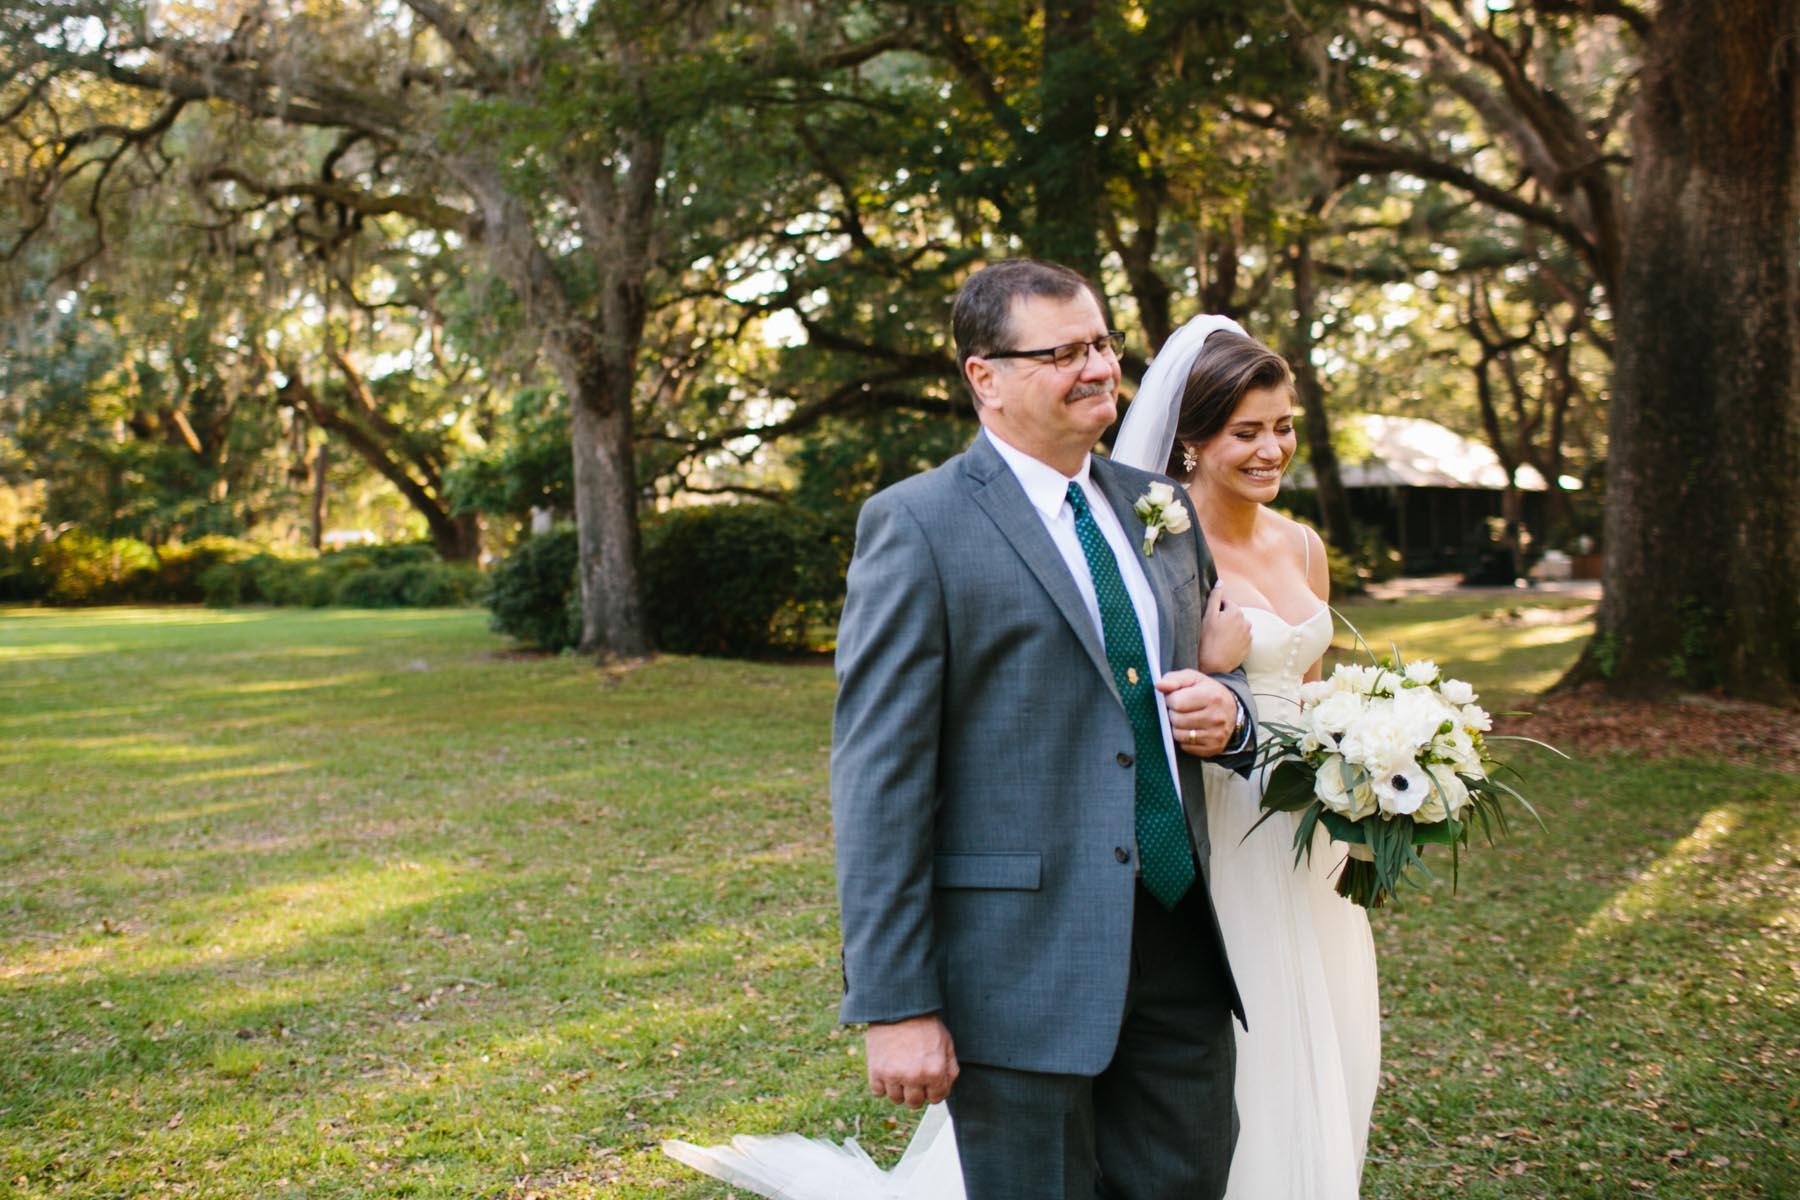 lowry wedding blog eden garden florida wedding-59